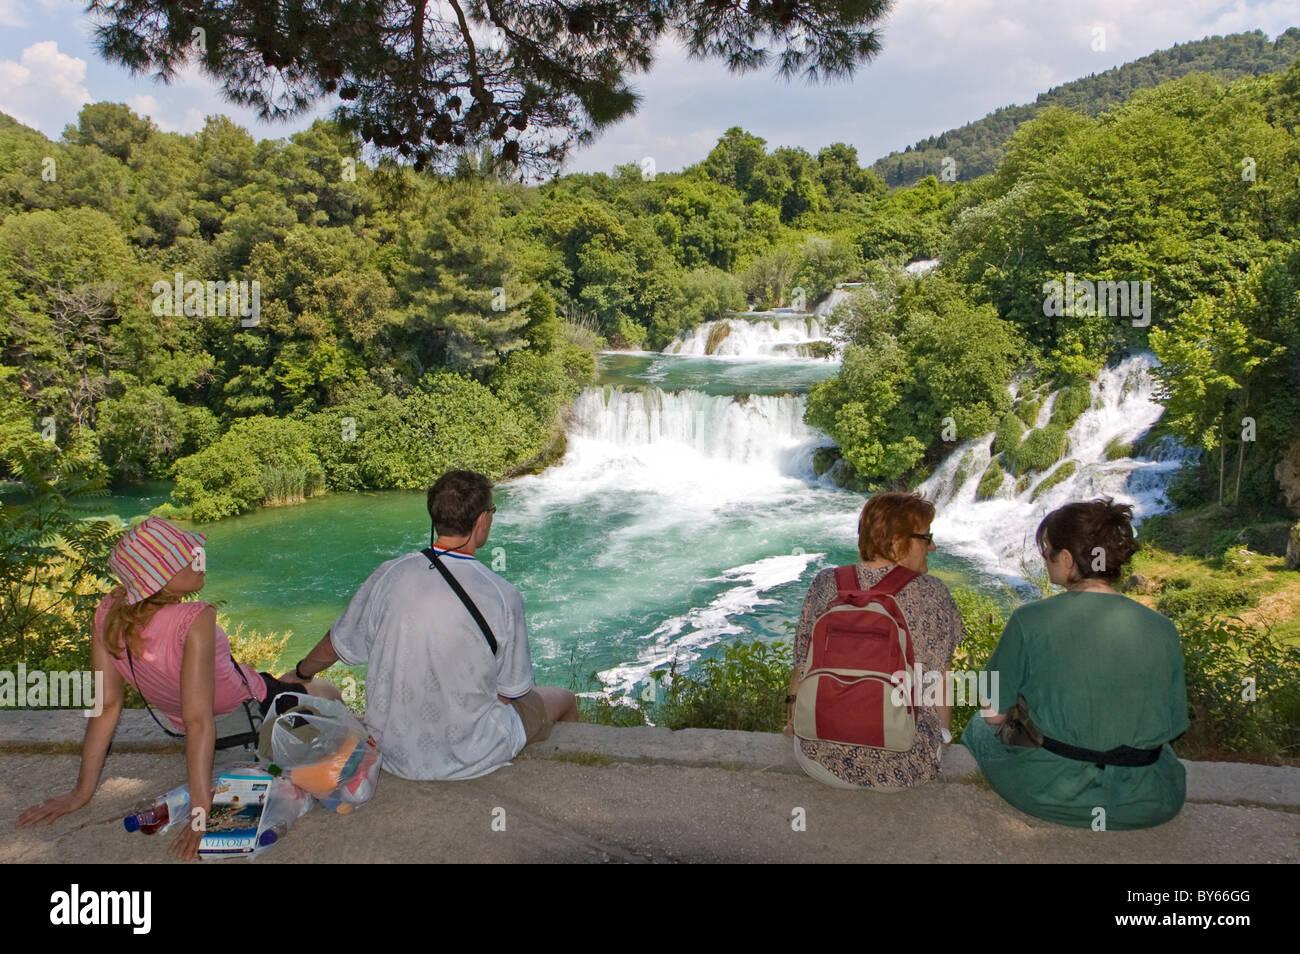 Elk192-2359 Croatia, Dalmatian Coast, Krka National Park, waterfalls with park visitors - Stock Image